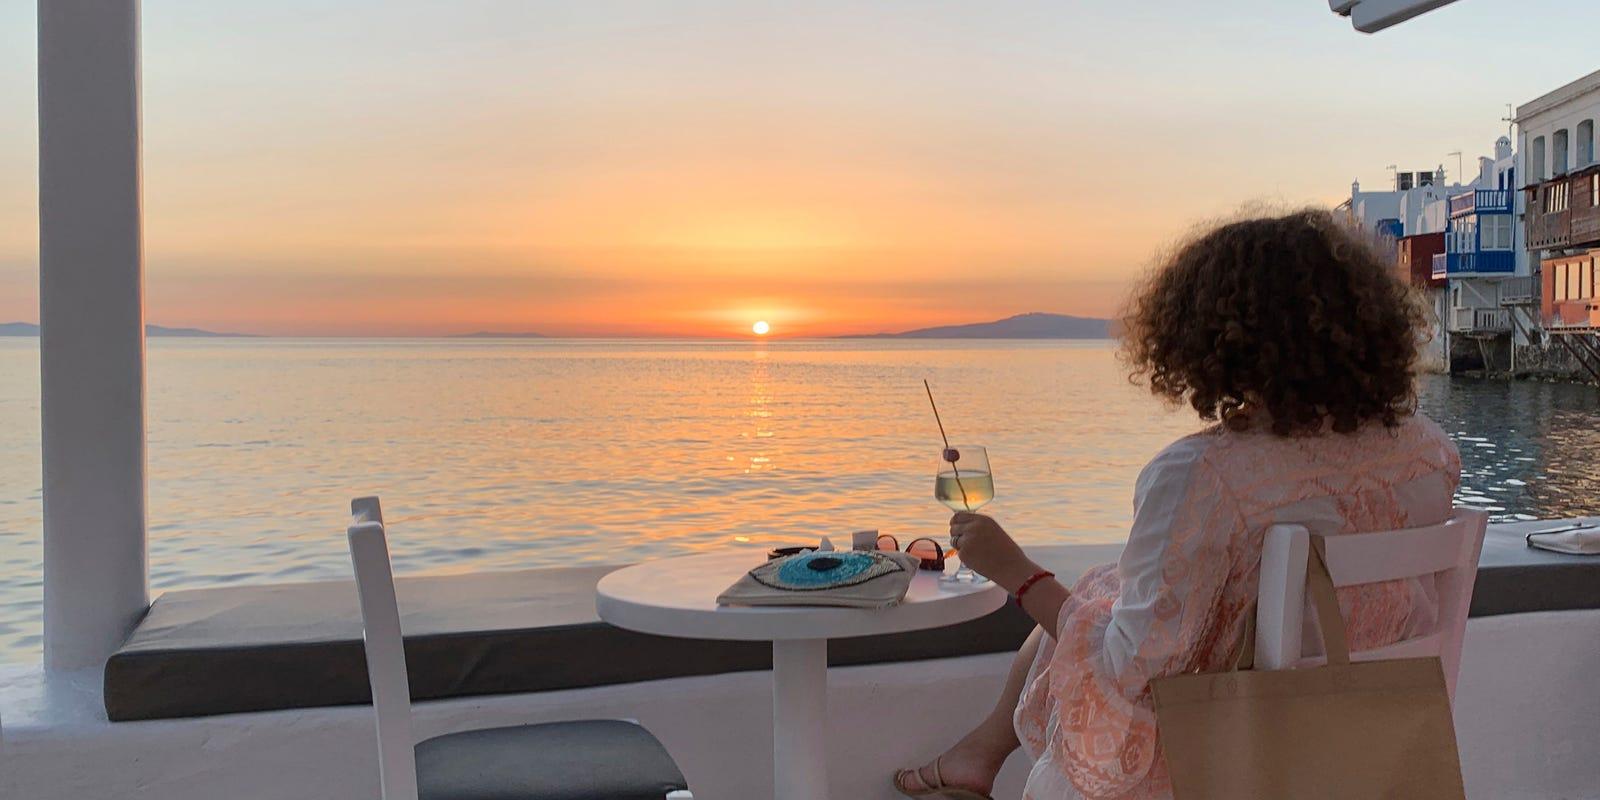 Photo of Tourism Minister says Greece will remain open to US travelers through tourist season | USA TODAY